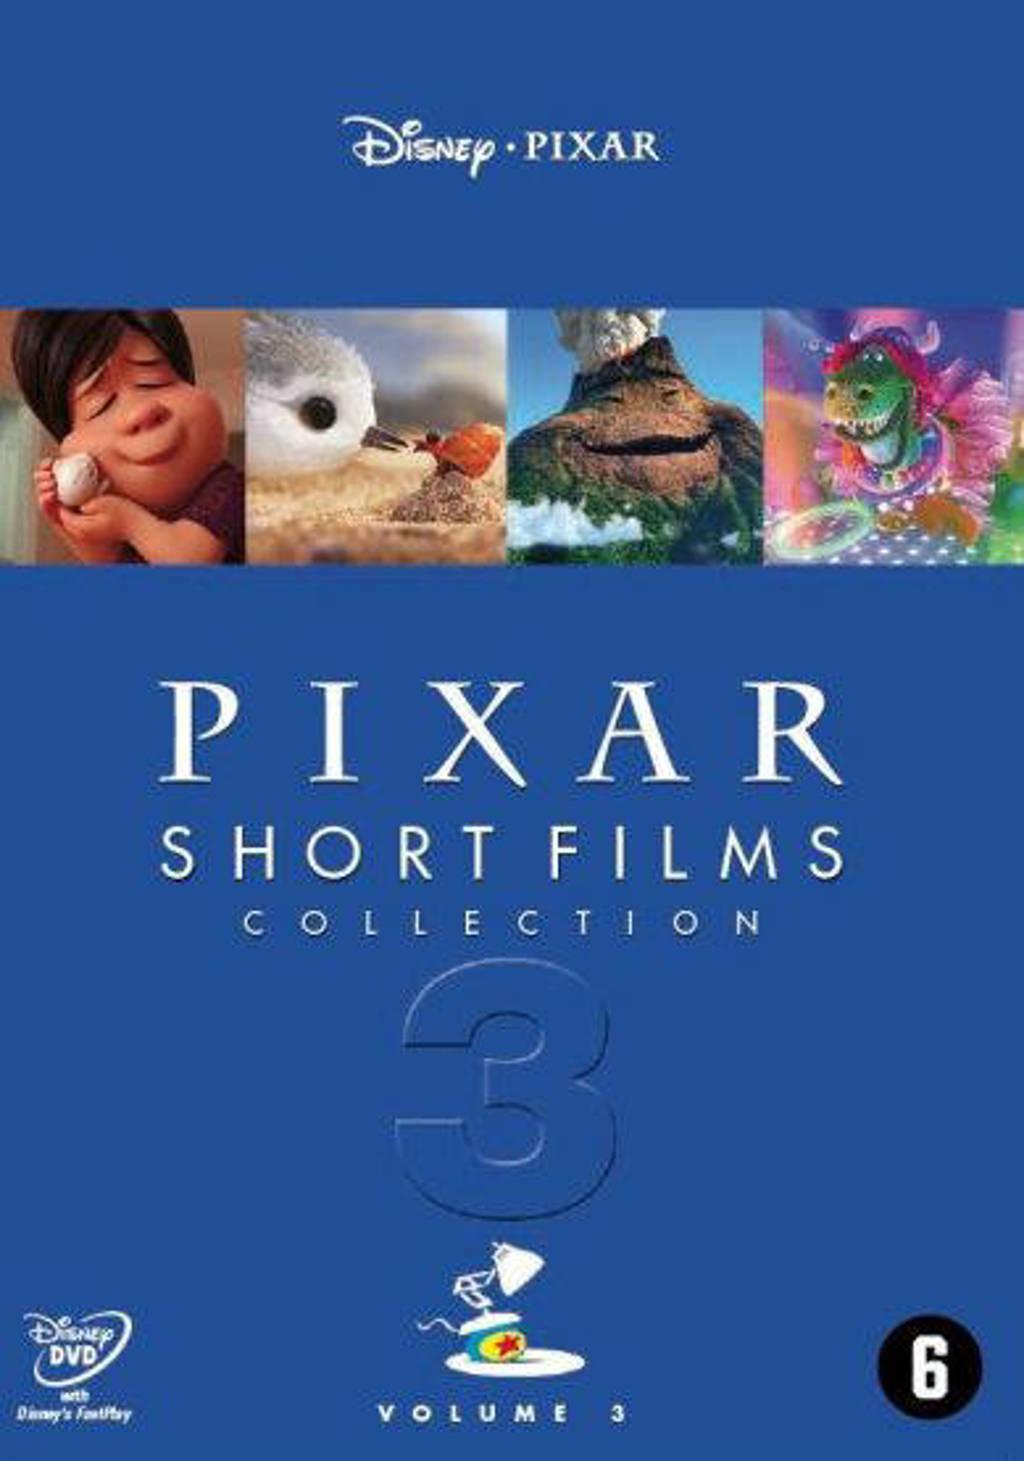 Pixar shorts 3 (DVD)